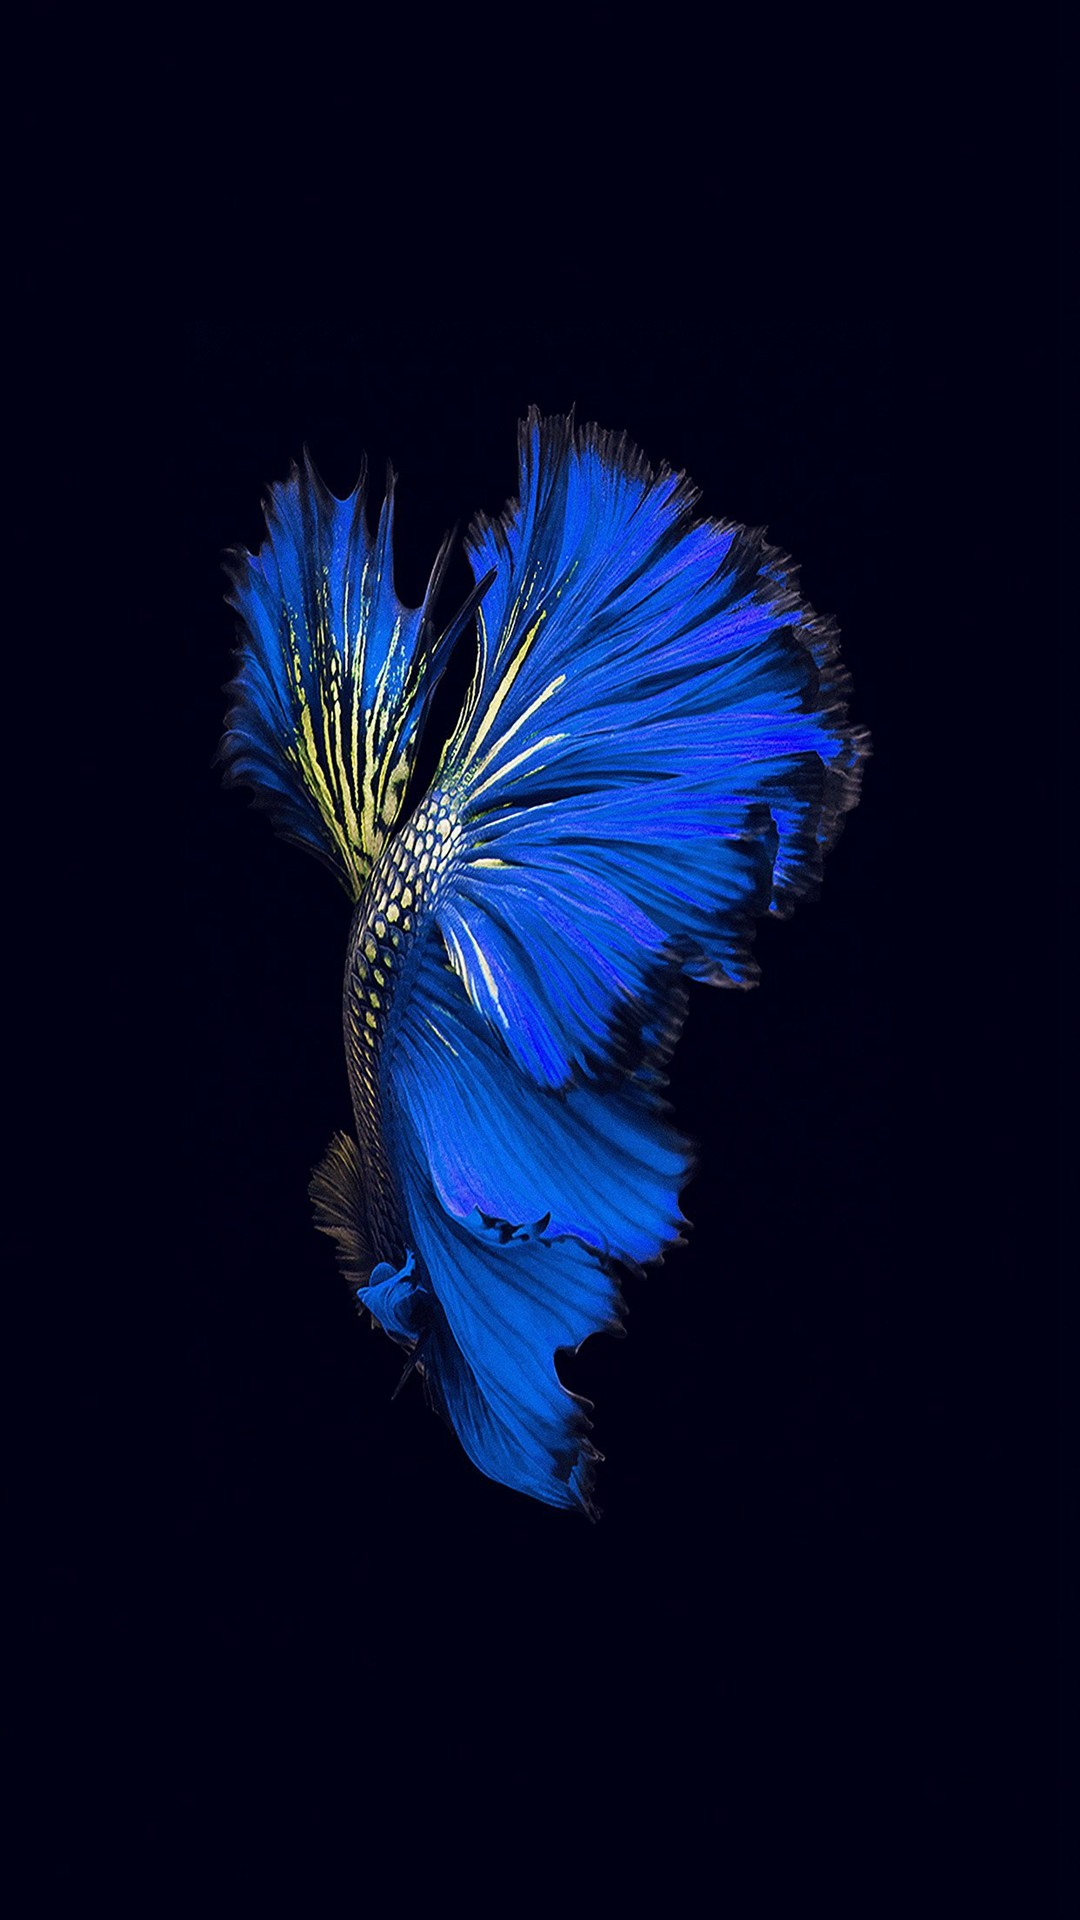 19011c18fe0 1080x1920 Apple Ios9 Fish Live Background Dark Blue iPhone 6 wallpaper